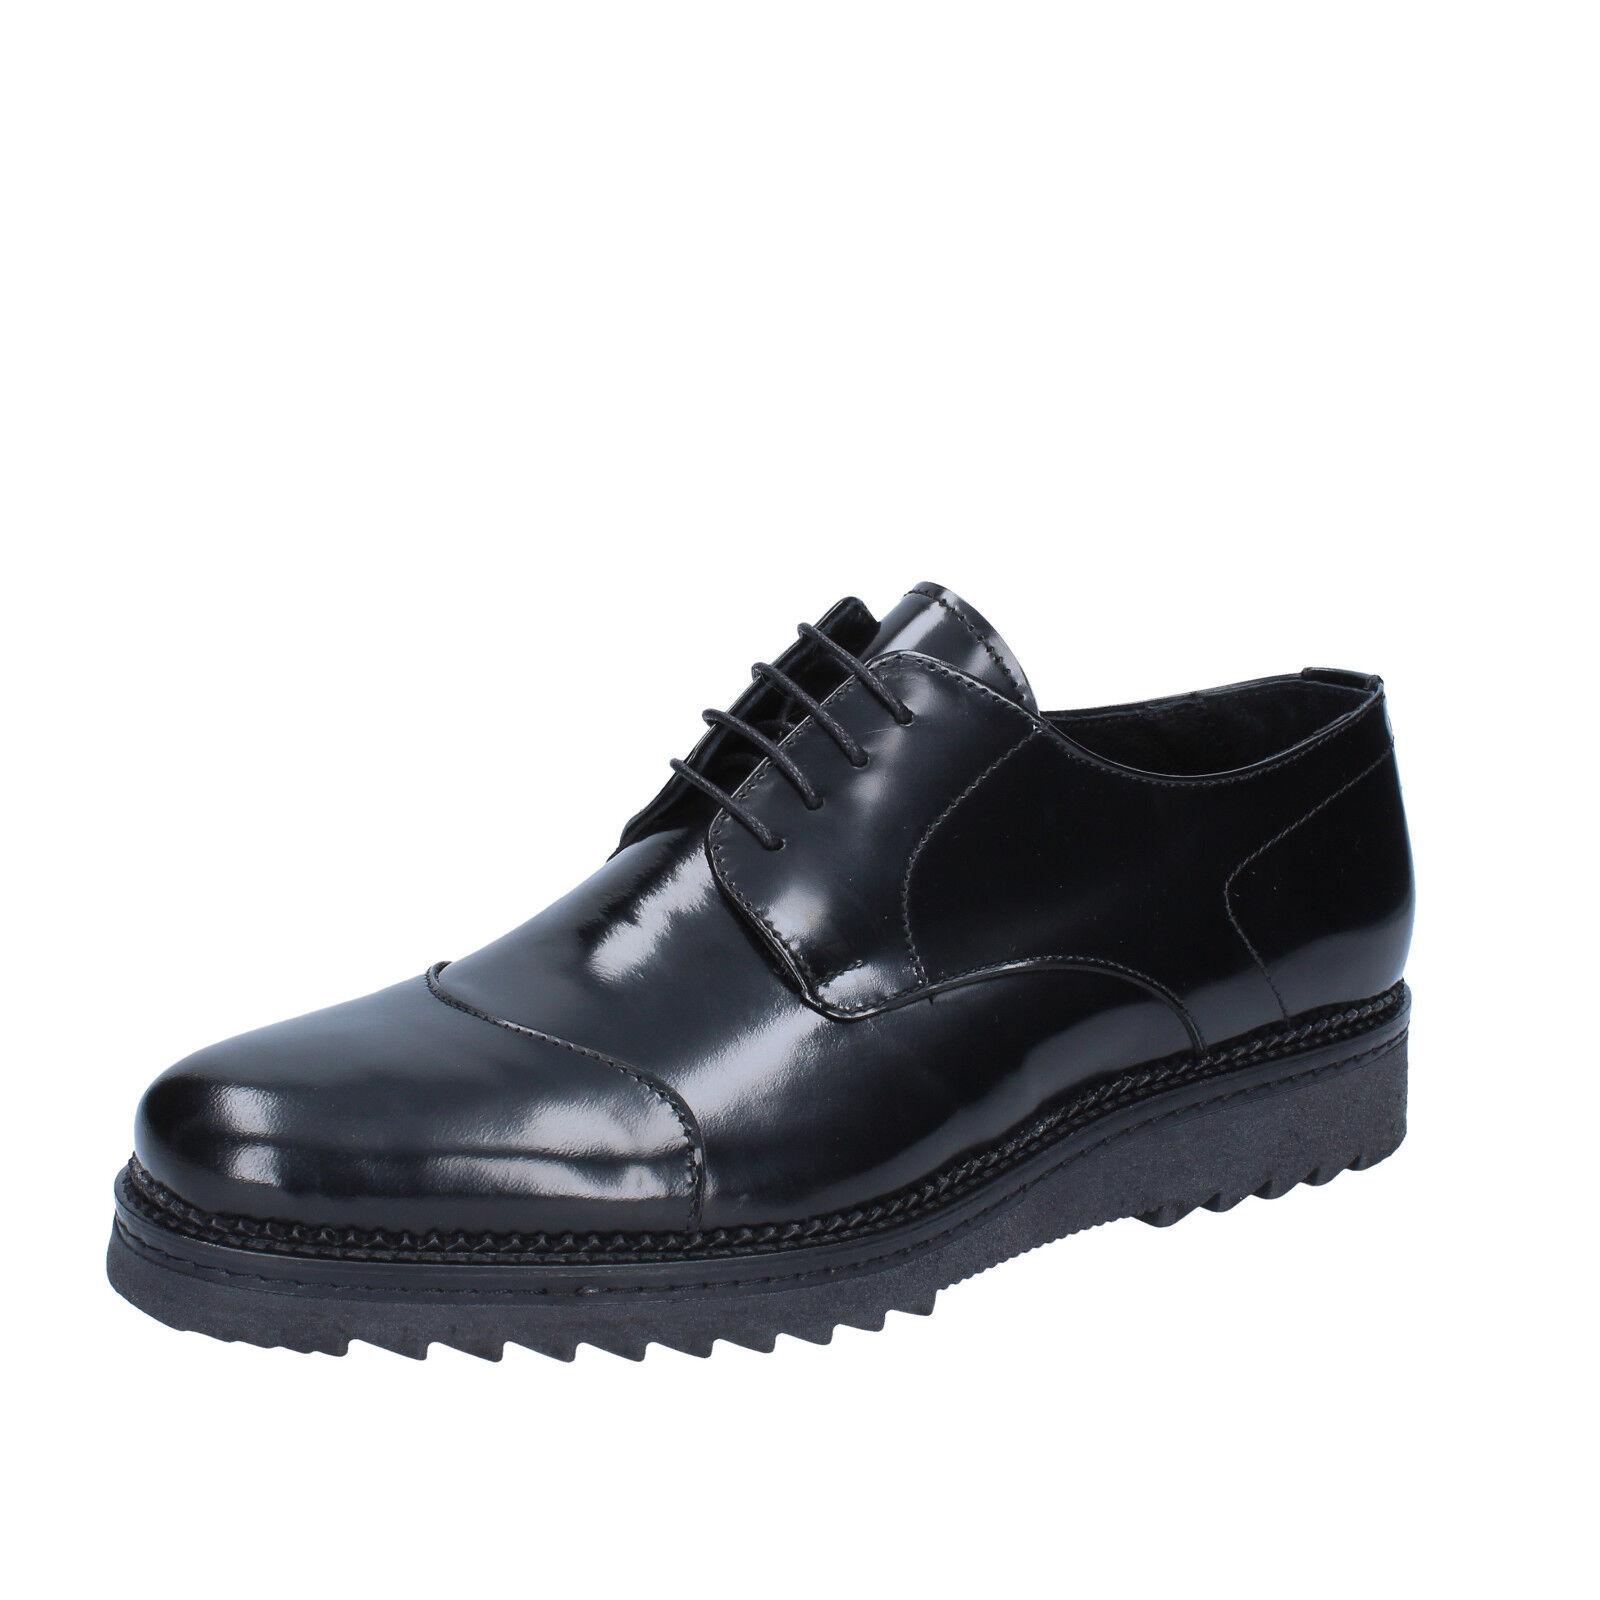 Homme Chaussures Salvo Barone 9 (UE 43) Noir Élégant Cuir Brillant BZ171-43